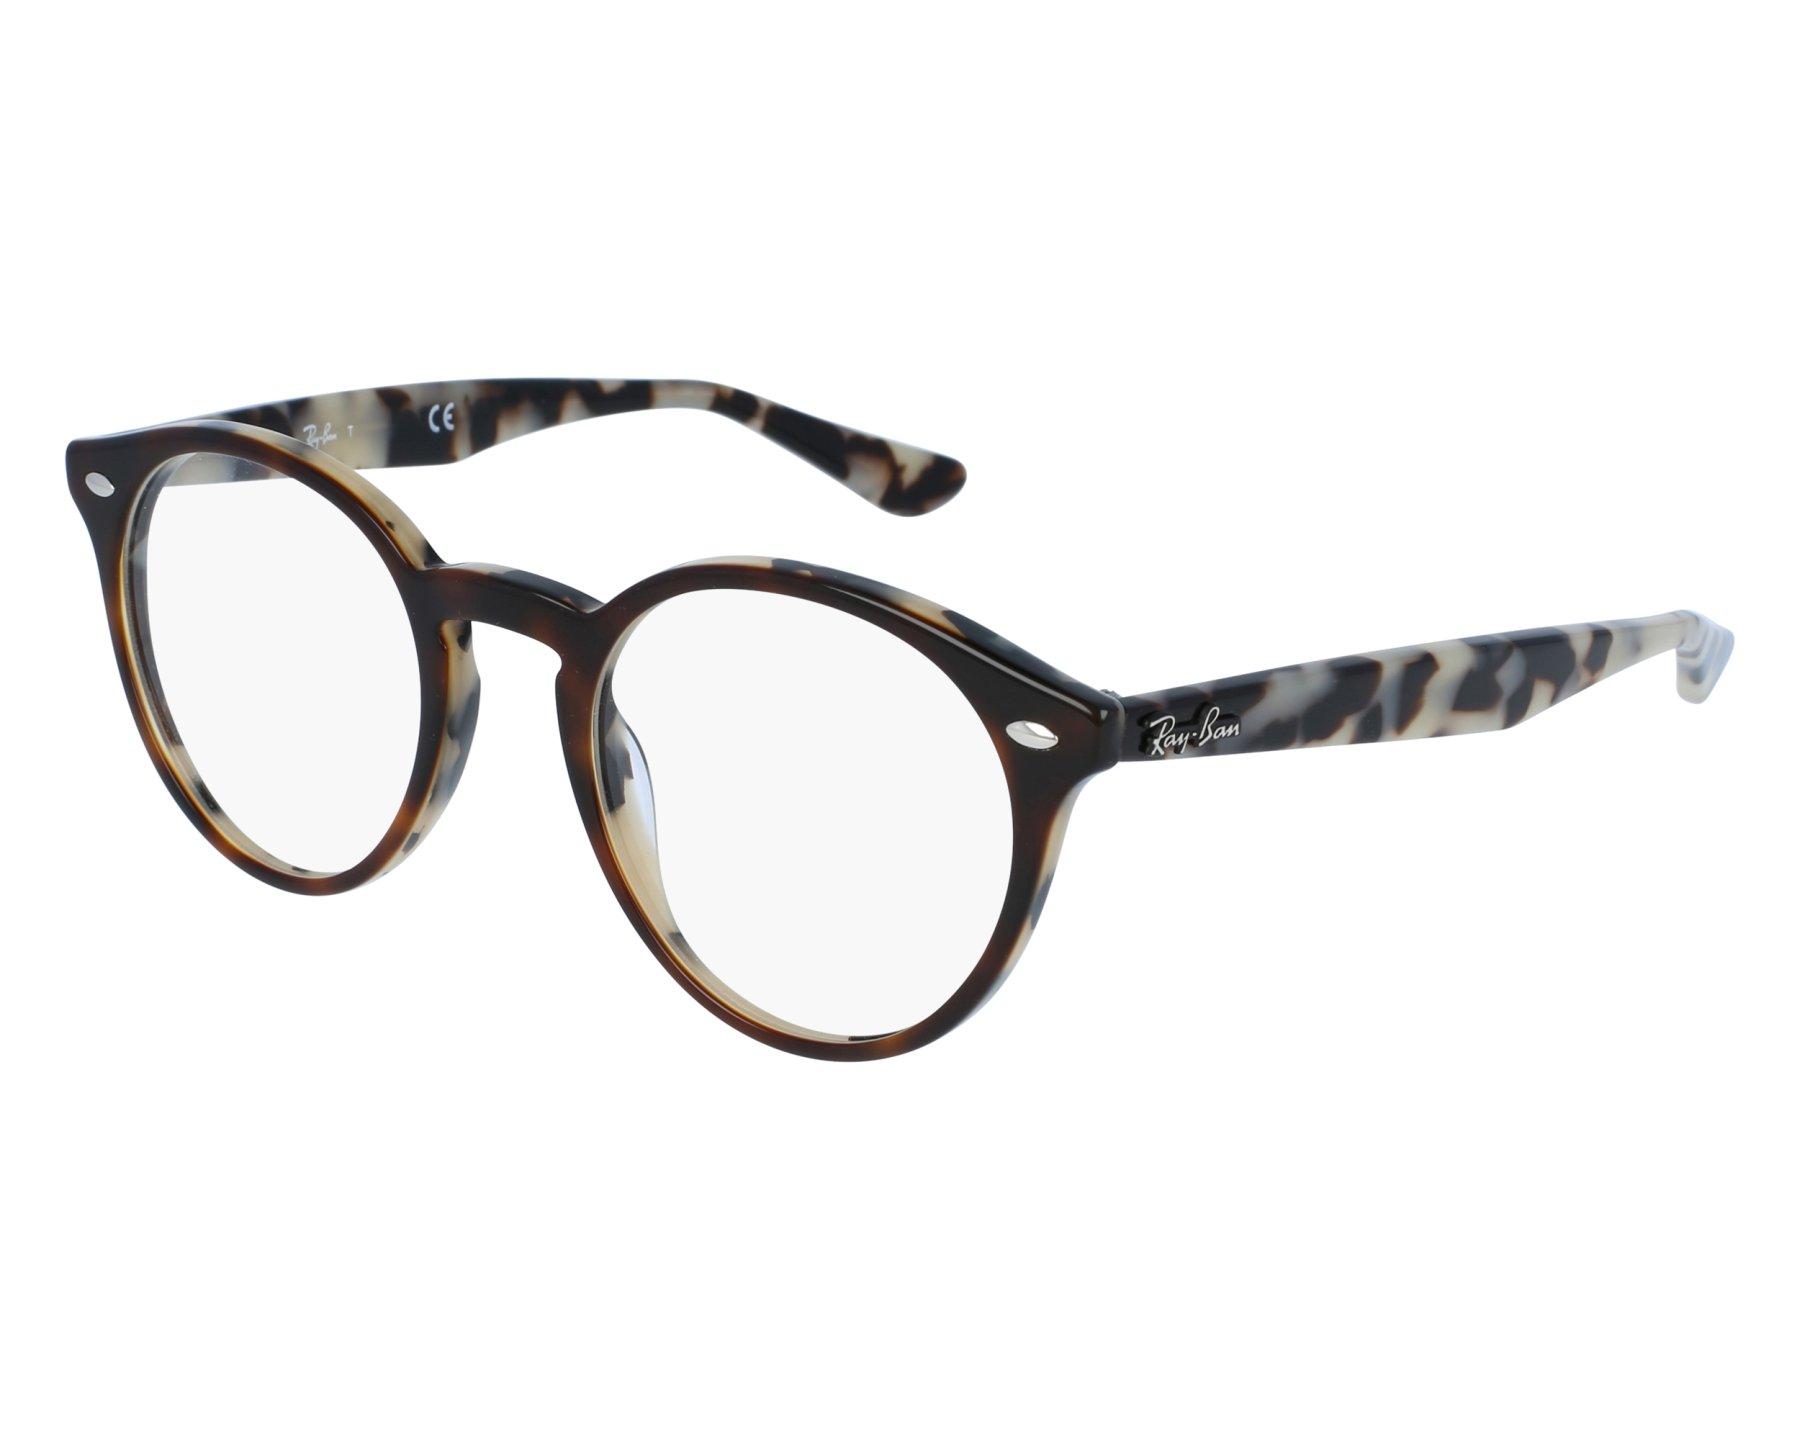 c33b32dcc02 eyeglasses Ray-Ban RX-2180-V 5676 47-21 Havana Brown front